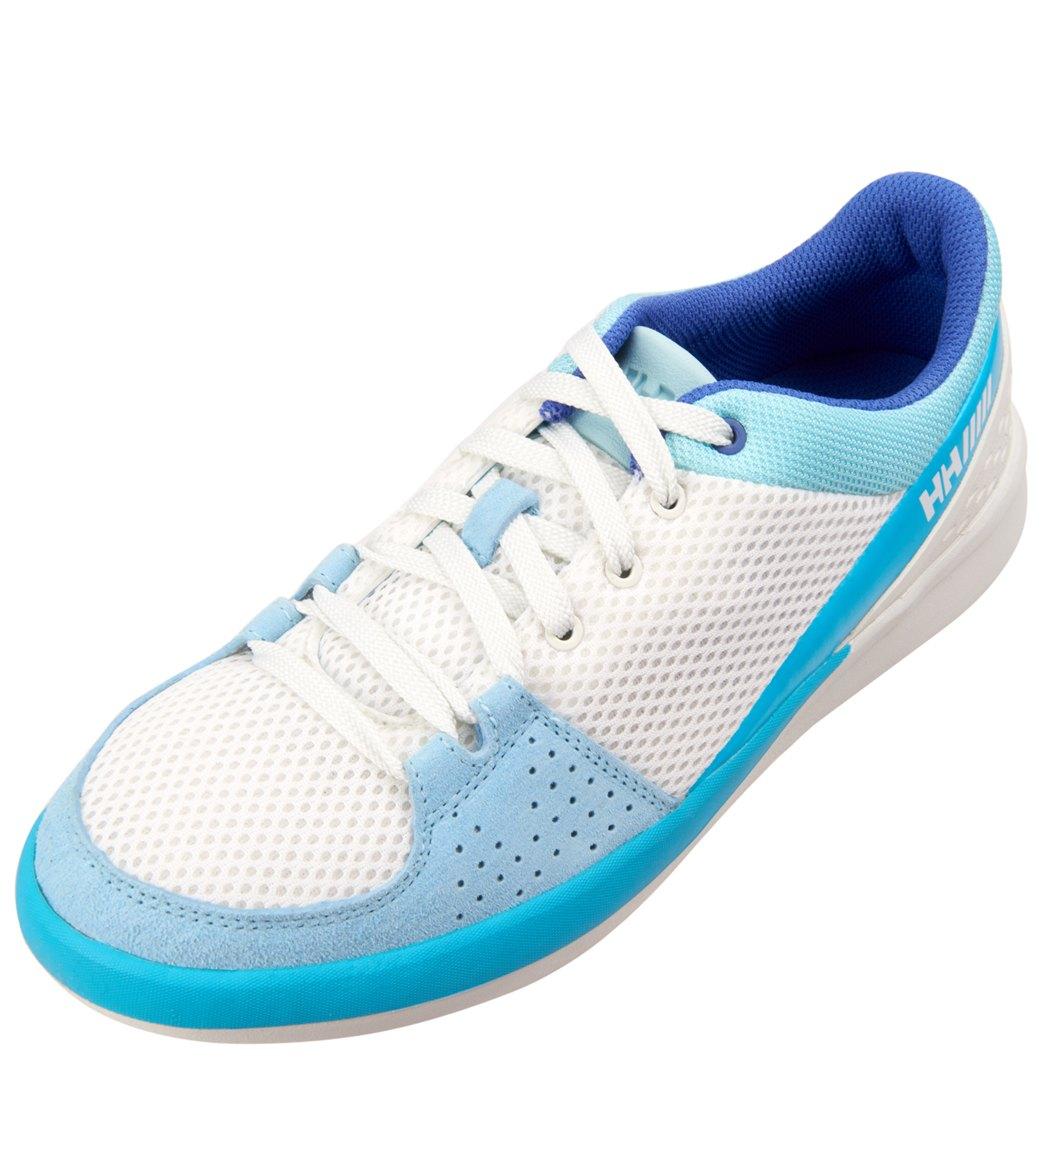 fb89480f117b7 Helly Hansen Women's W HH 5.5 M Water Shoe